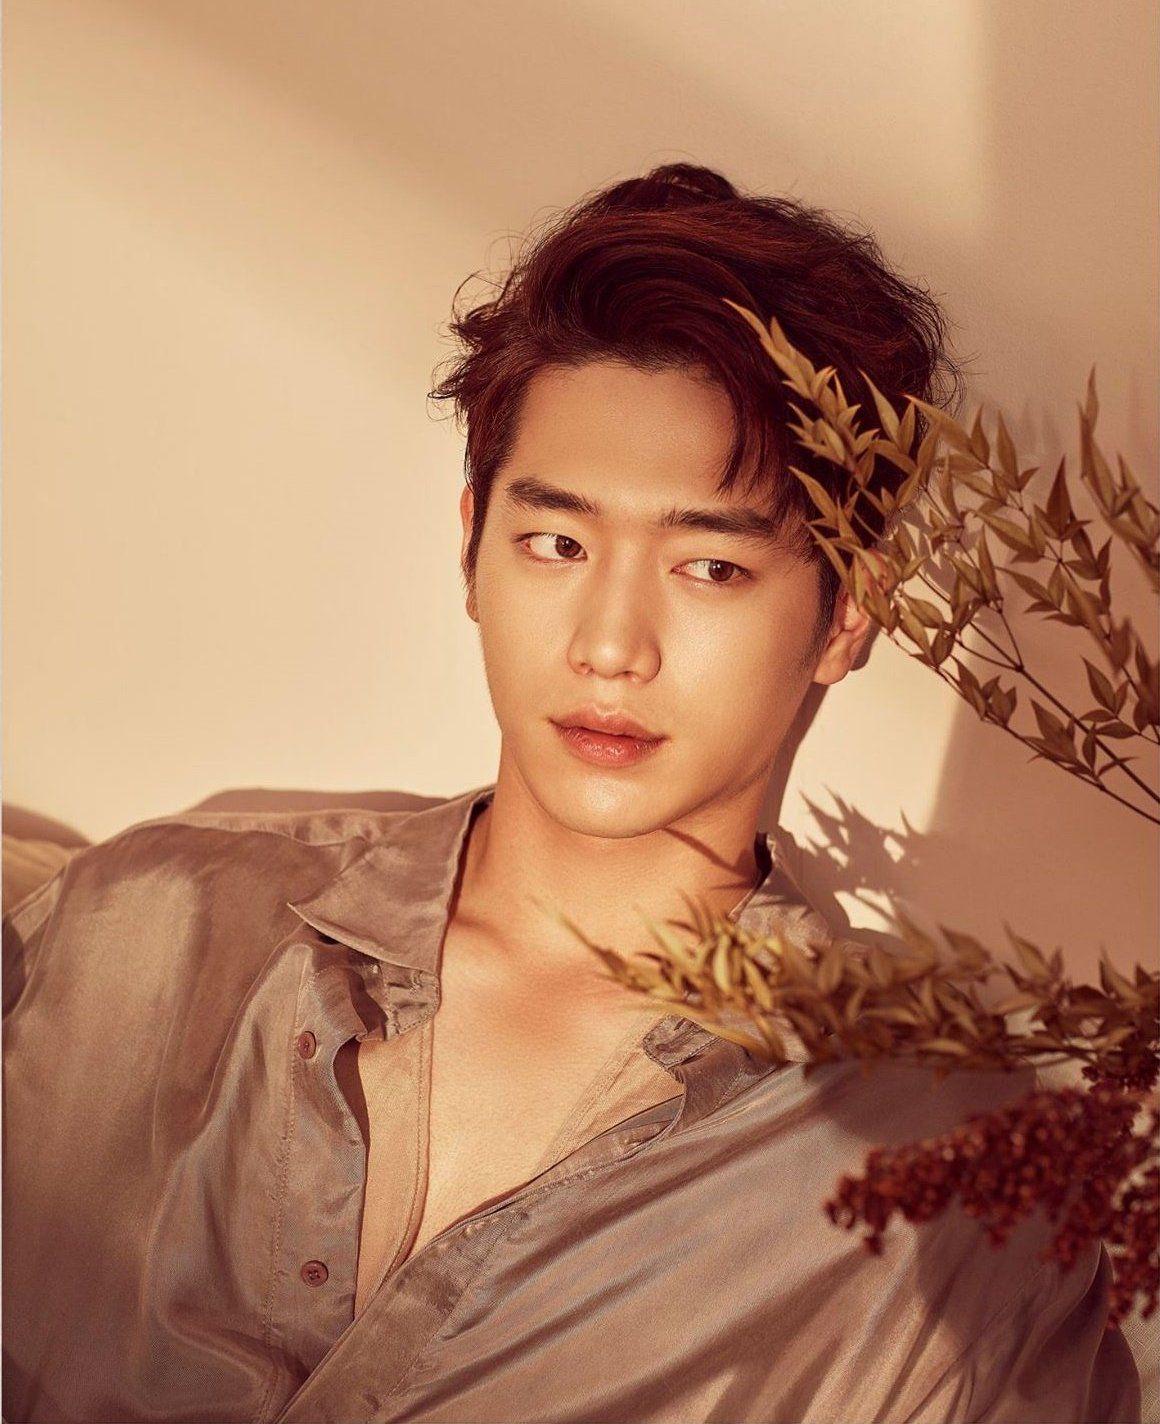 Profile seo kang joon Seo KangJoon